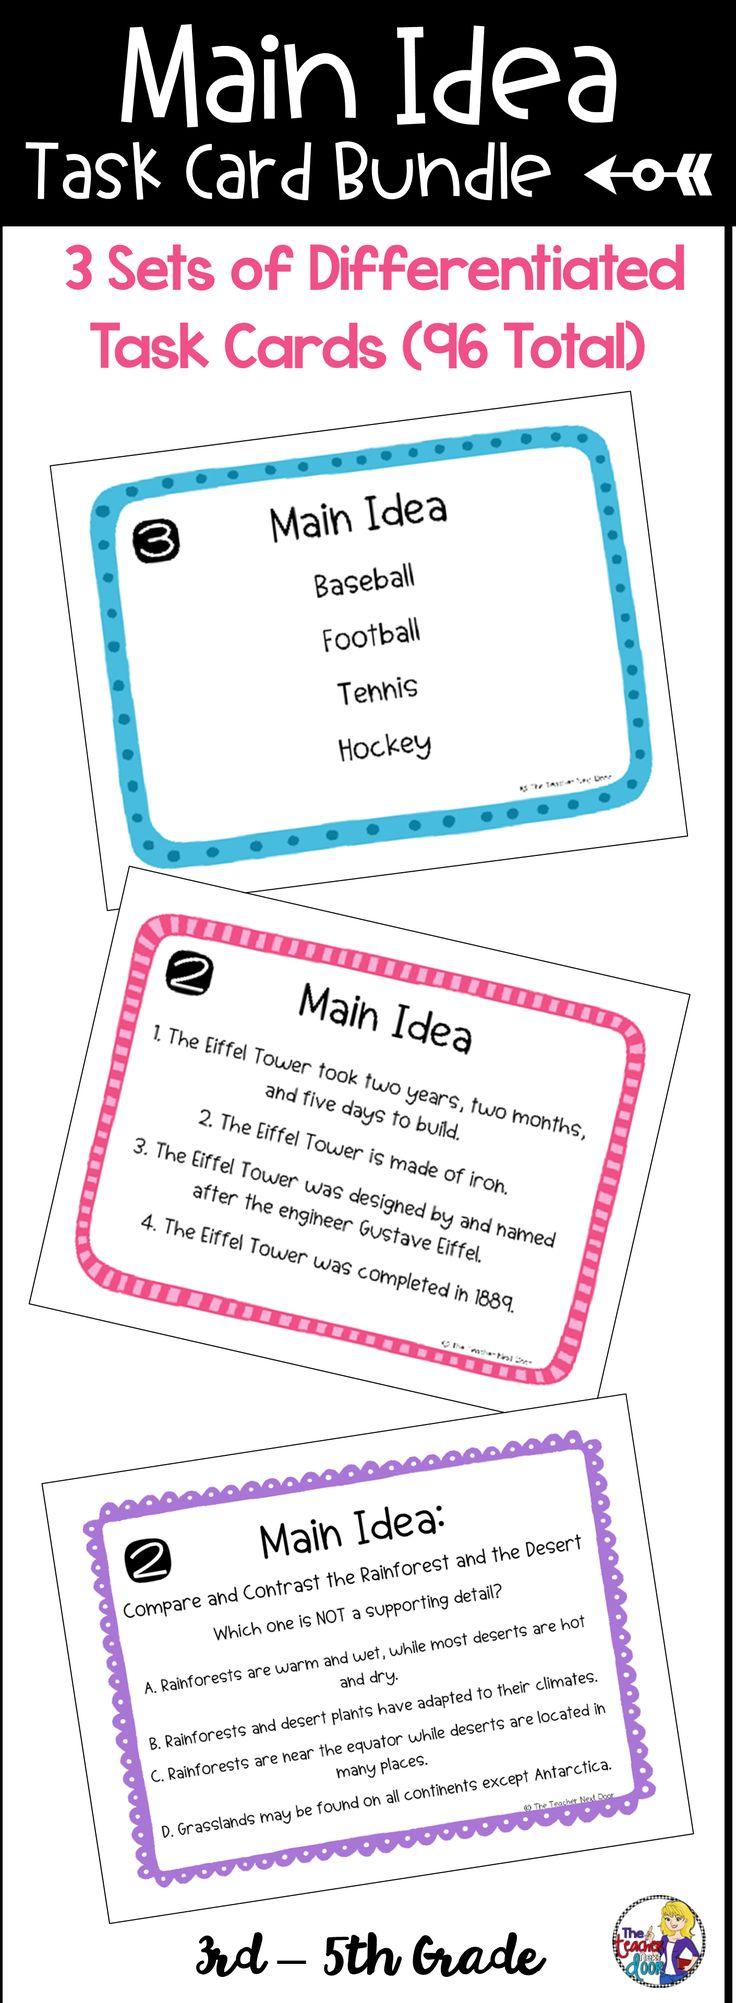 worksheet 4th Grade Main Idea Worksheets 255 best main idea using informational text images on pinterest task card bundle